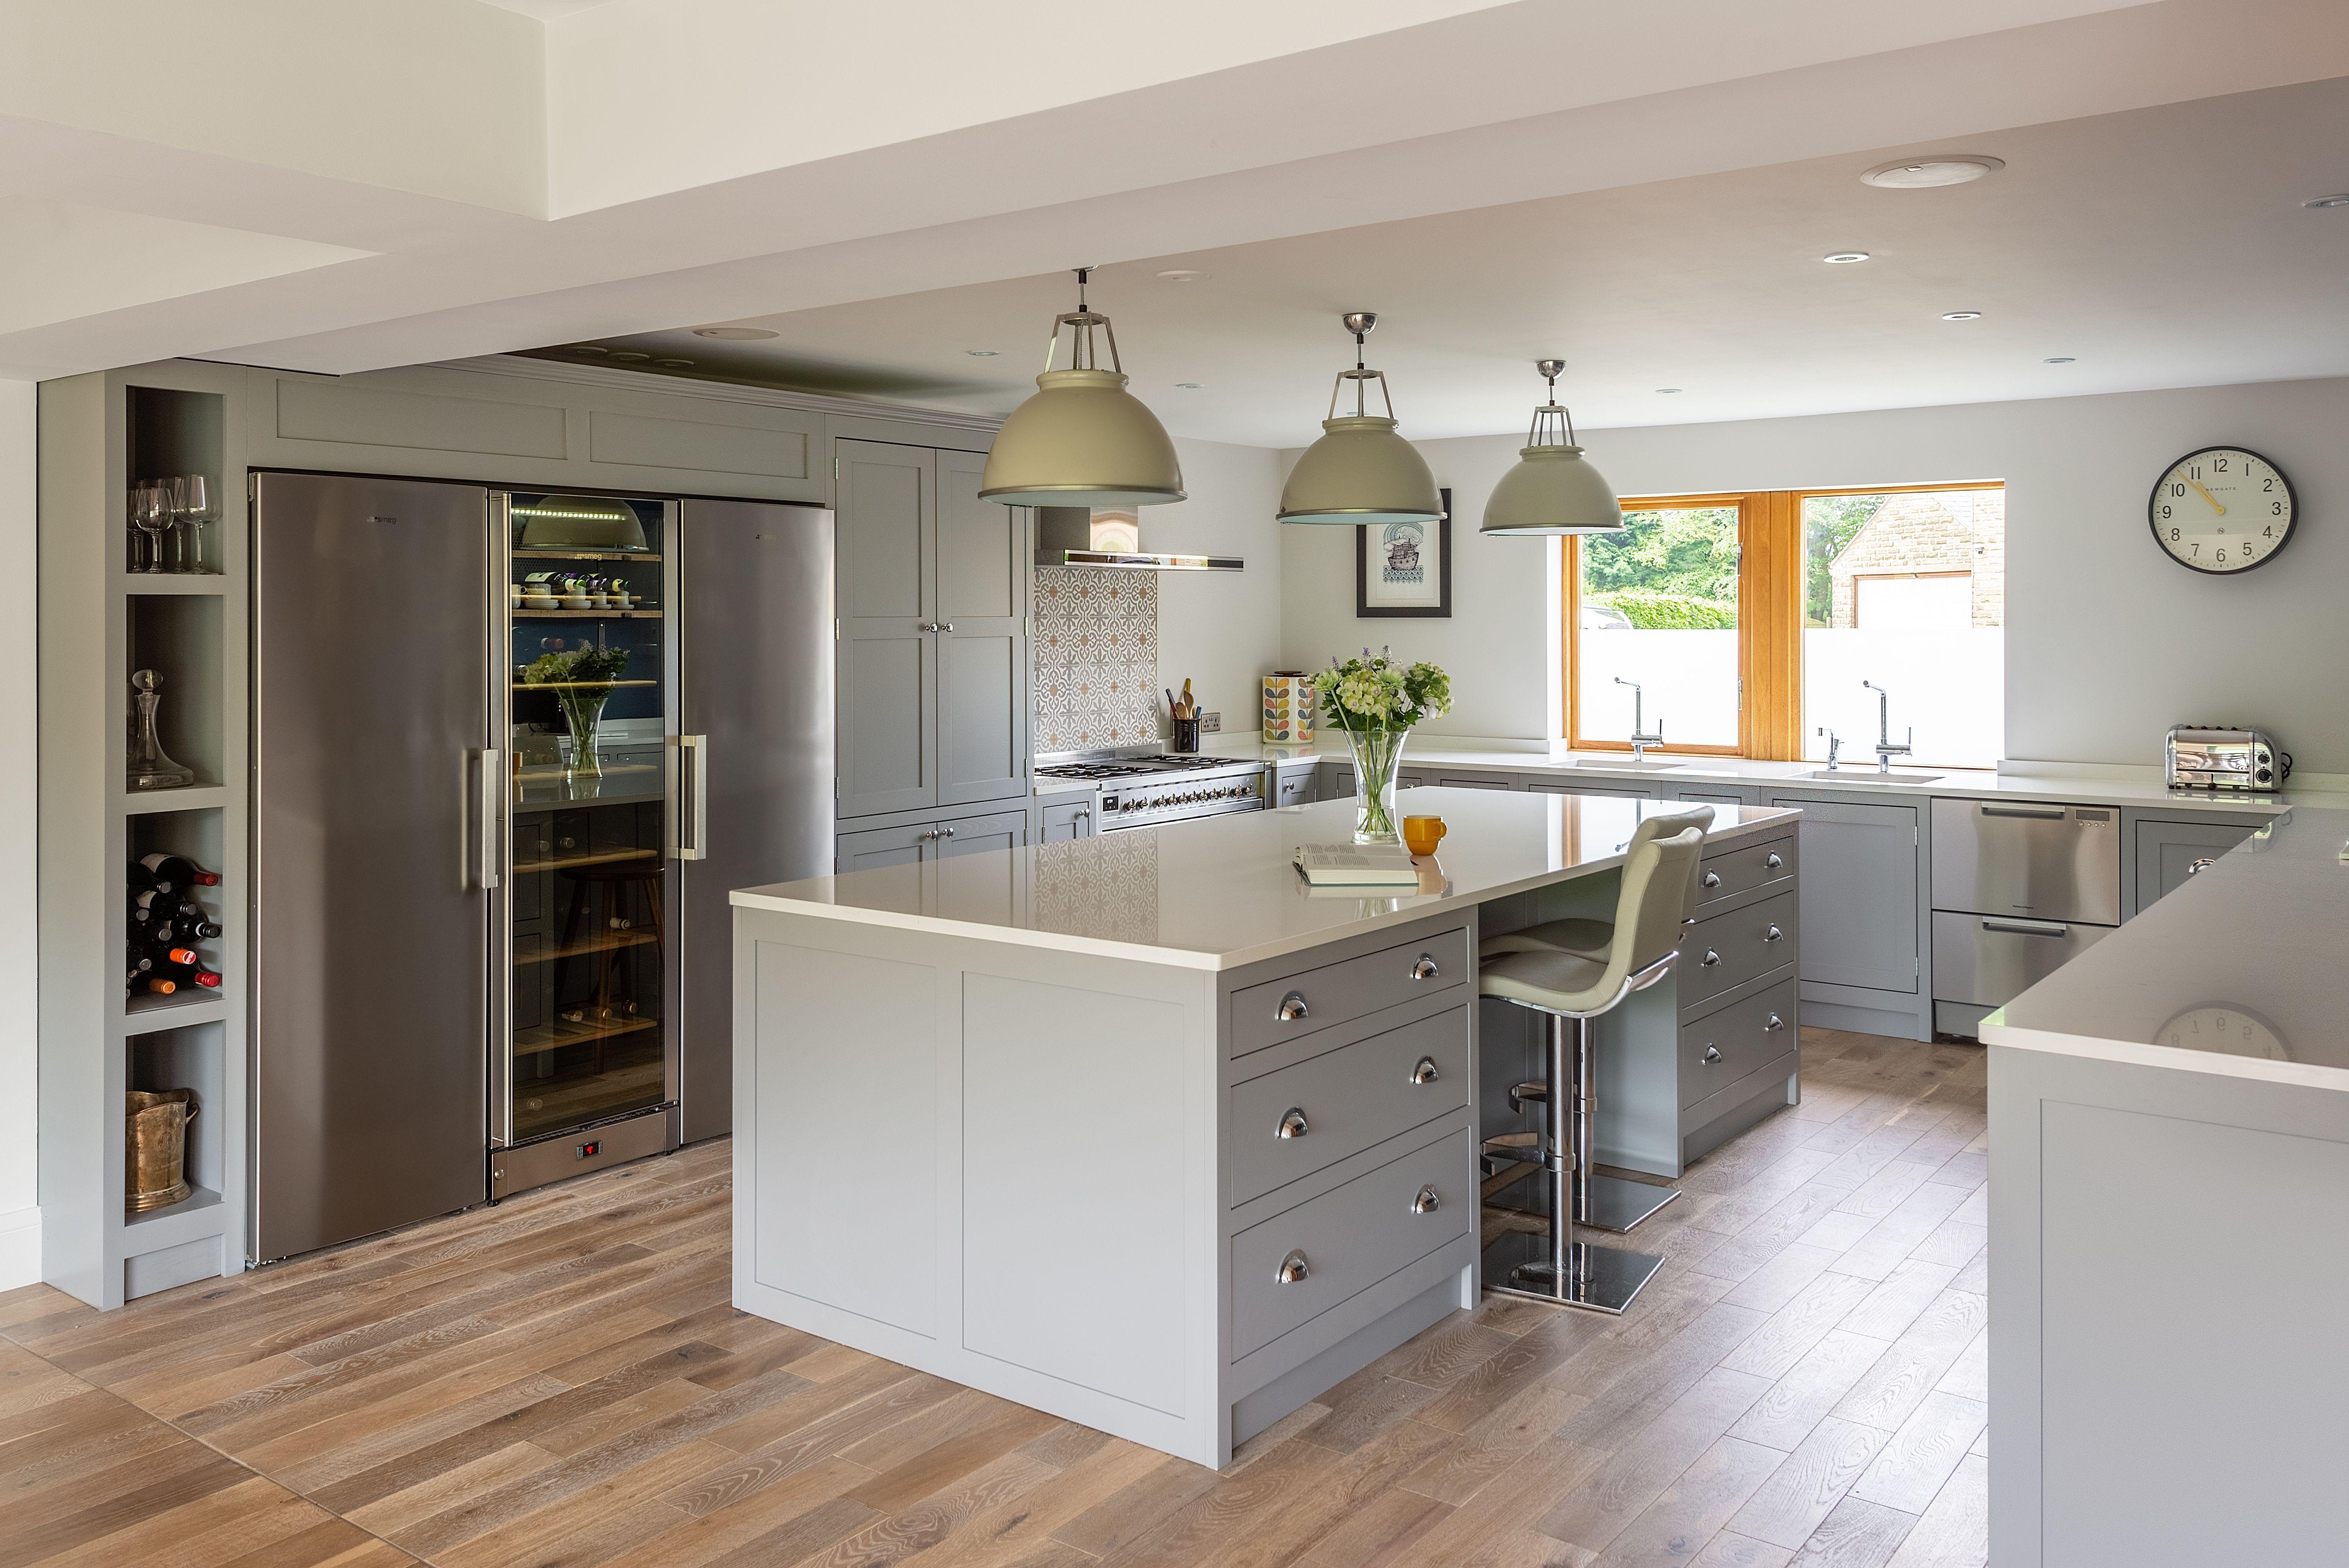 American fridge freezer | Shaker style kitchens, Shaker ...